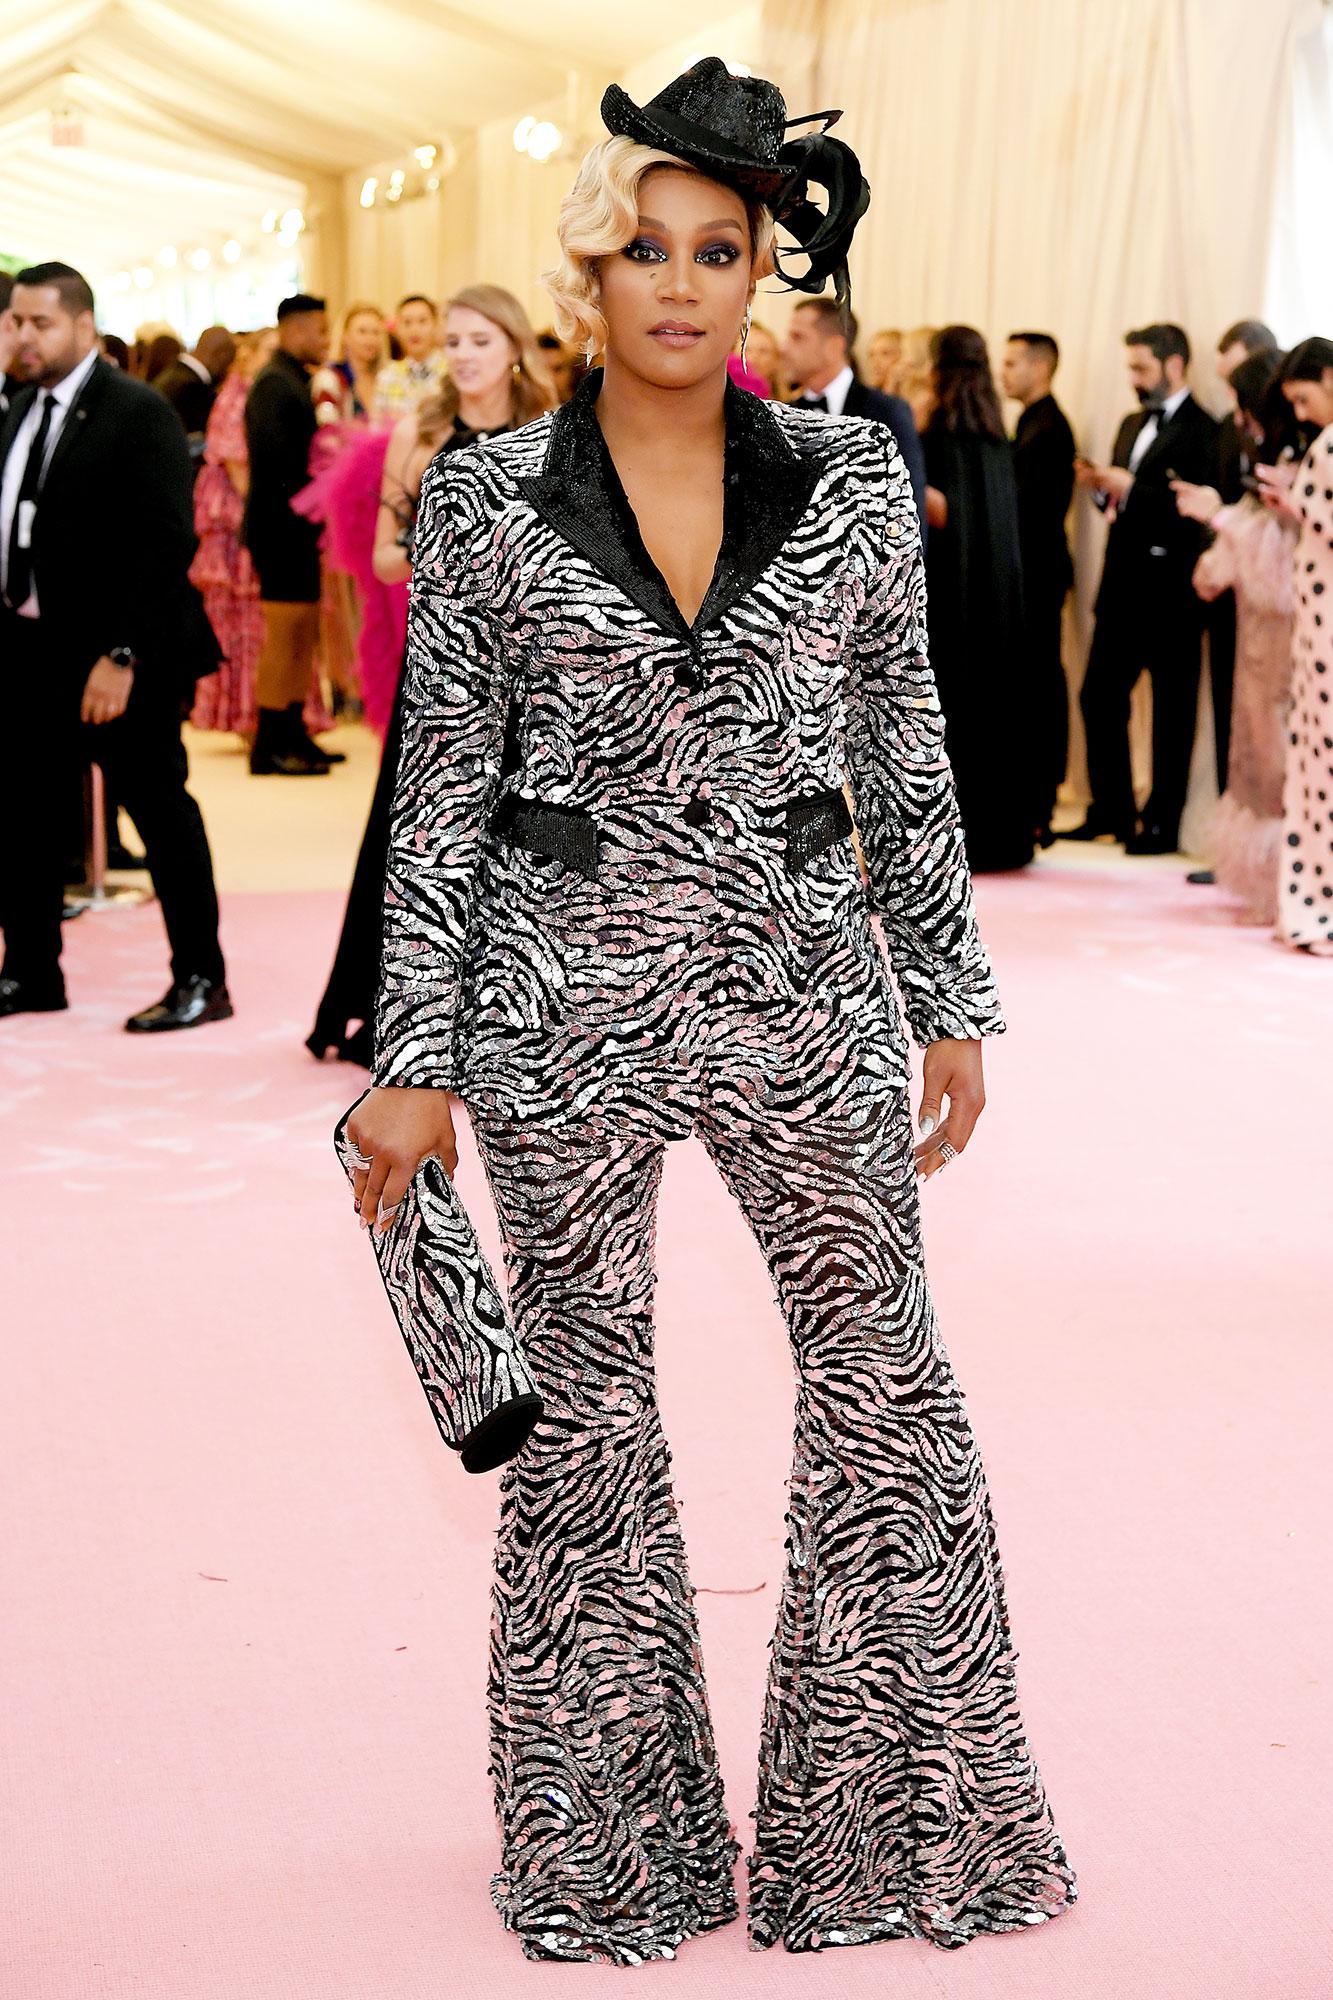 Tiffany Haddish met gala 2019 - Wearing a sequined animal-print Michael Kors suit with Butani, Djula and Hueb jewels.